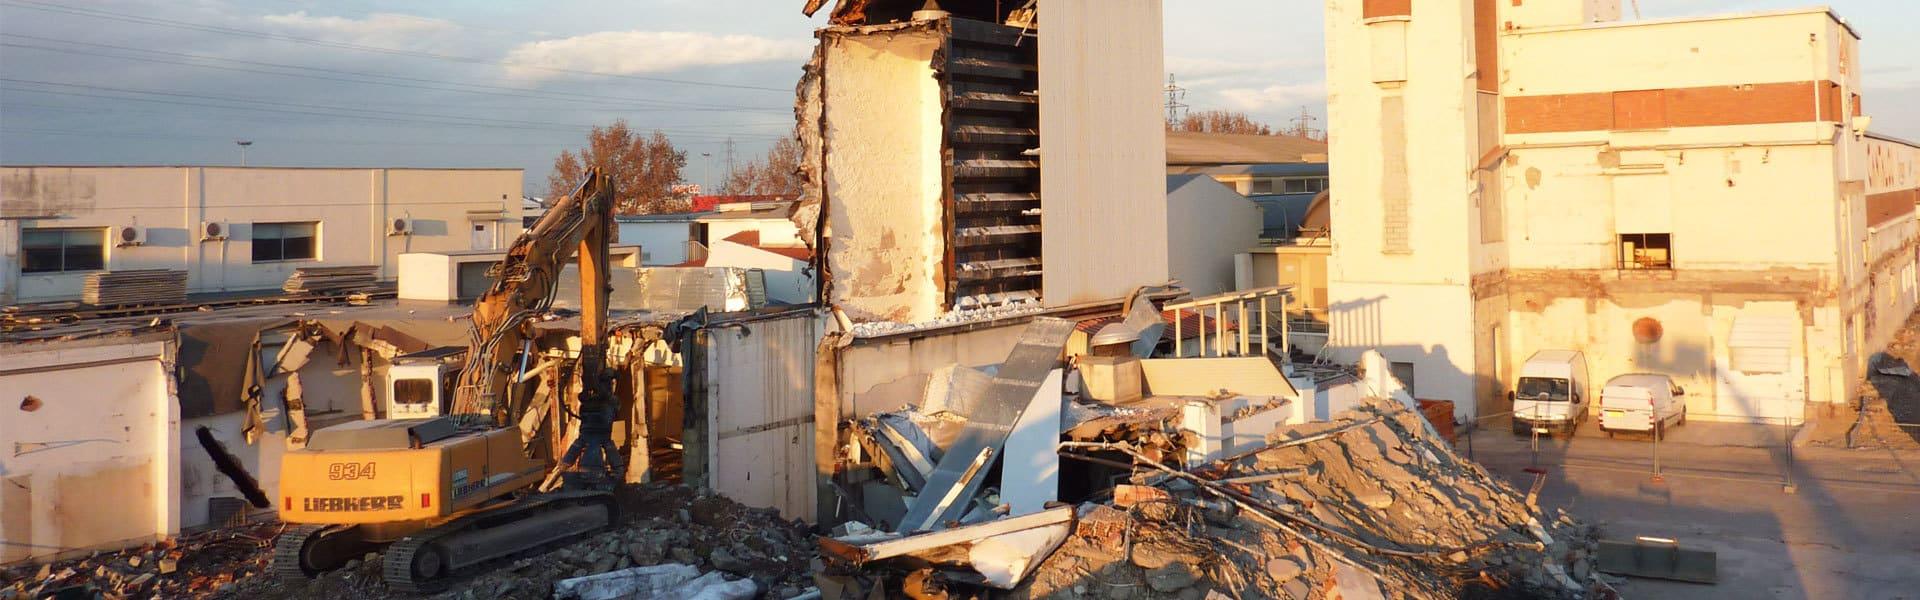 demolition-caminal-demantelement-usine-cantalou-perpignan